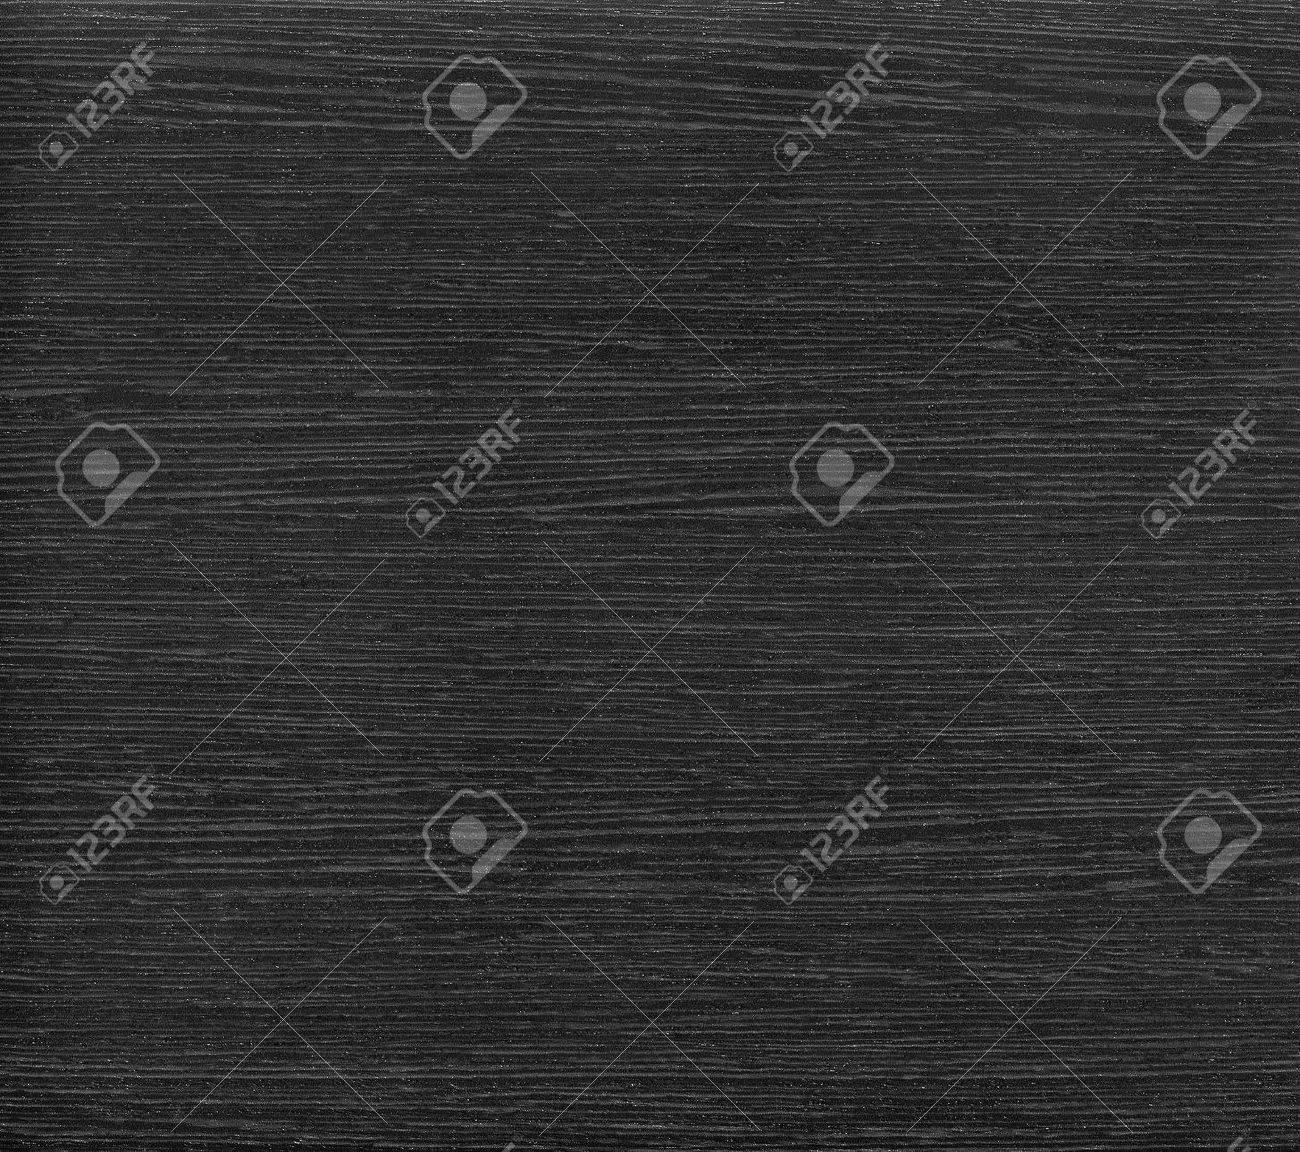 Black wood ebony texture Stock Photo - 11929904